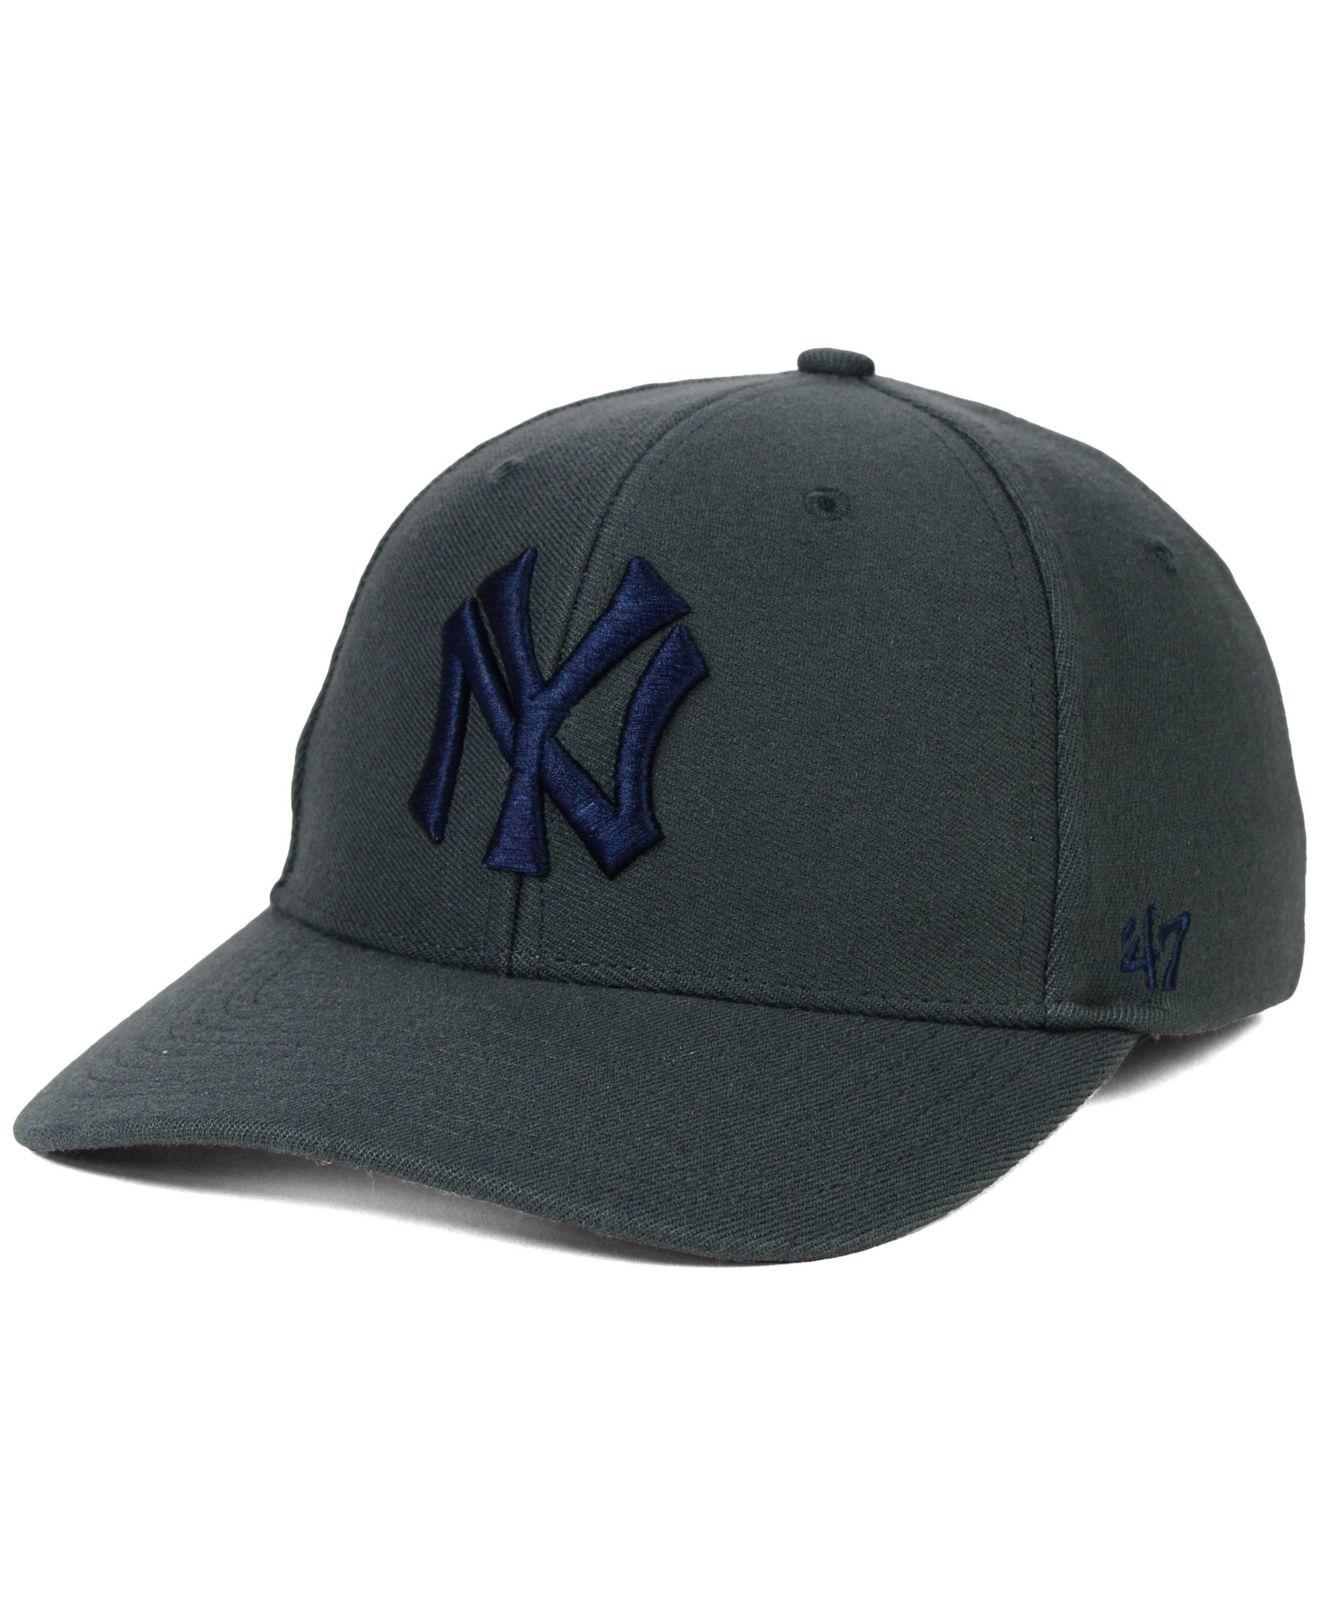 47 brand new york yankees contender cap in gray for men lyst. Black Bedroom Furniture Sets. Home Design Ideas